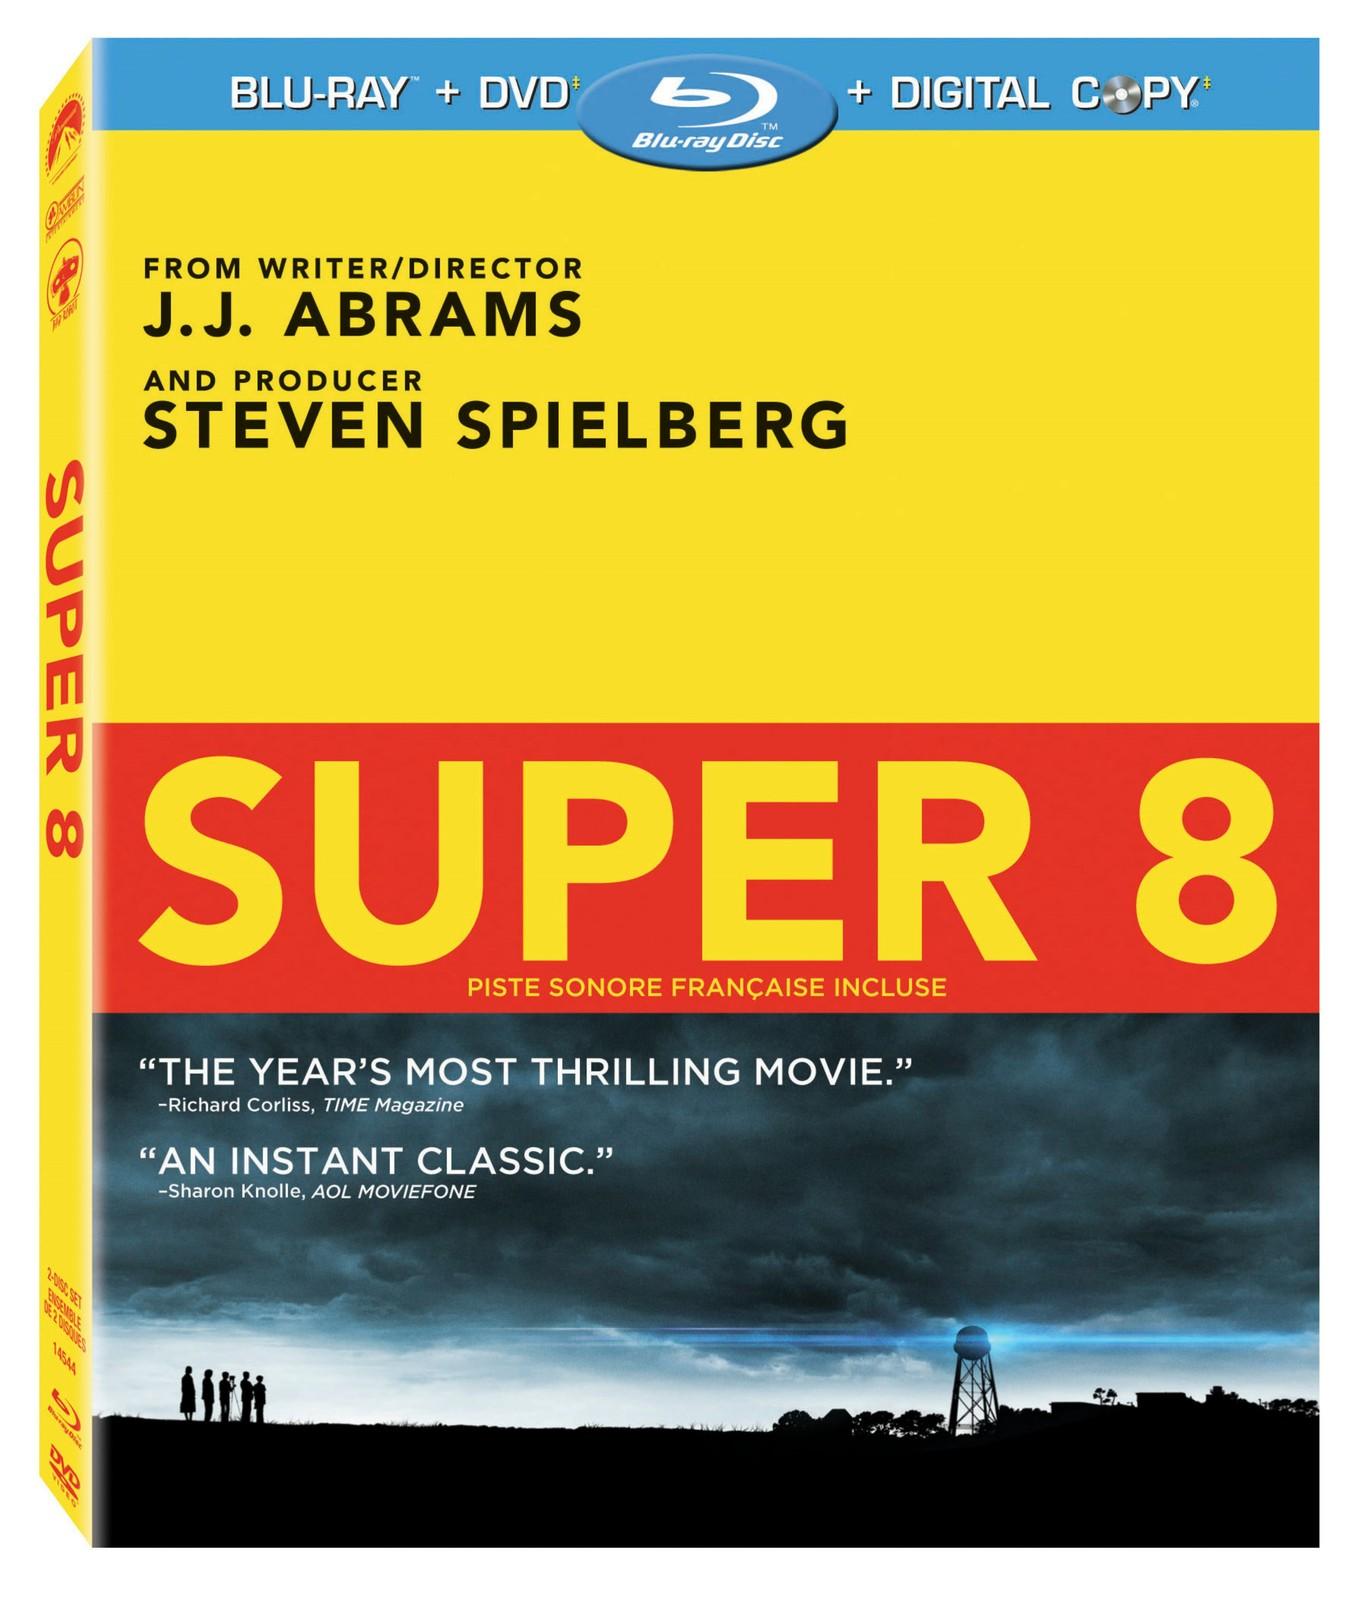 Super 8 blu ray